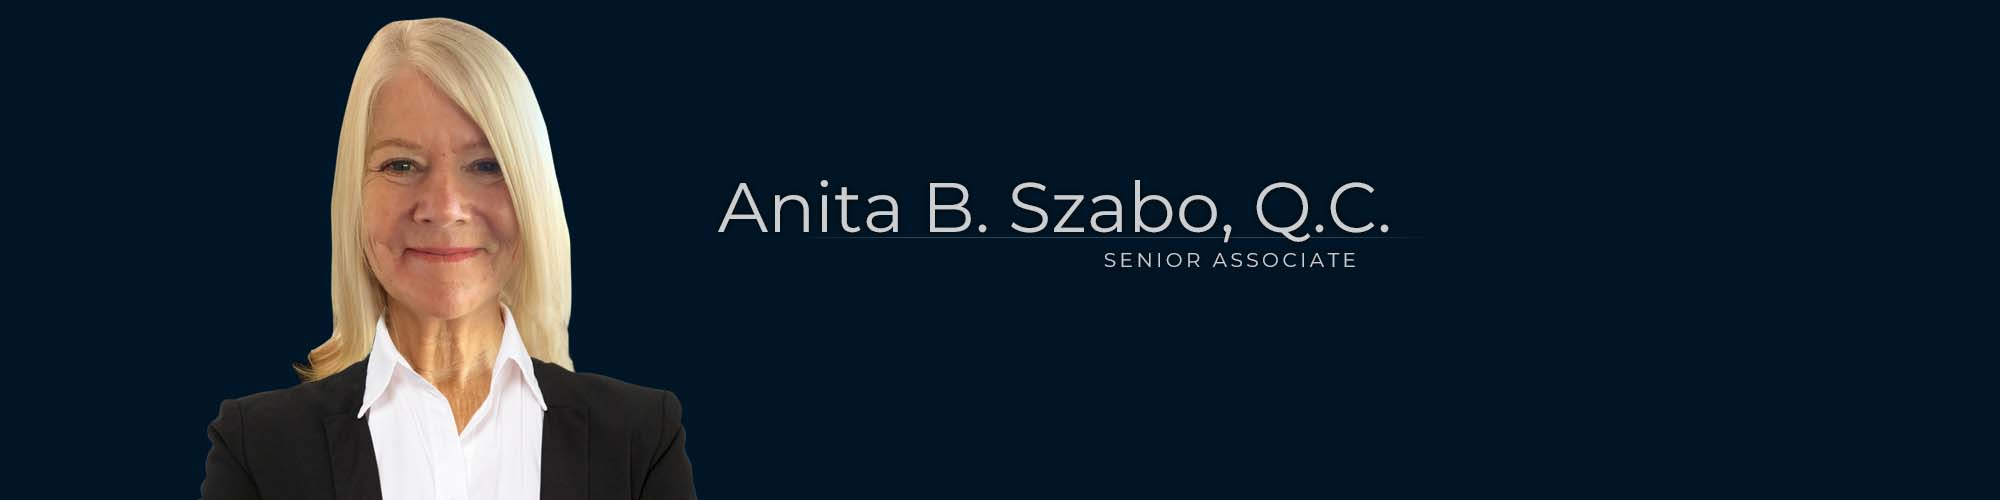 Anita B. Szabo, Q.C., Senior Associate at Dominion GovLaw LLP